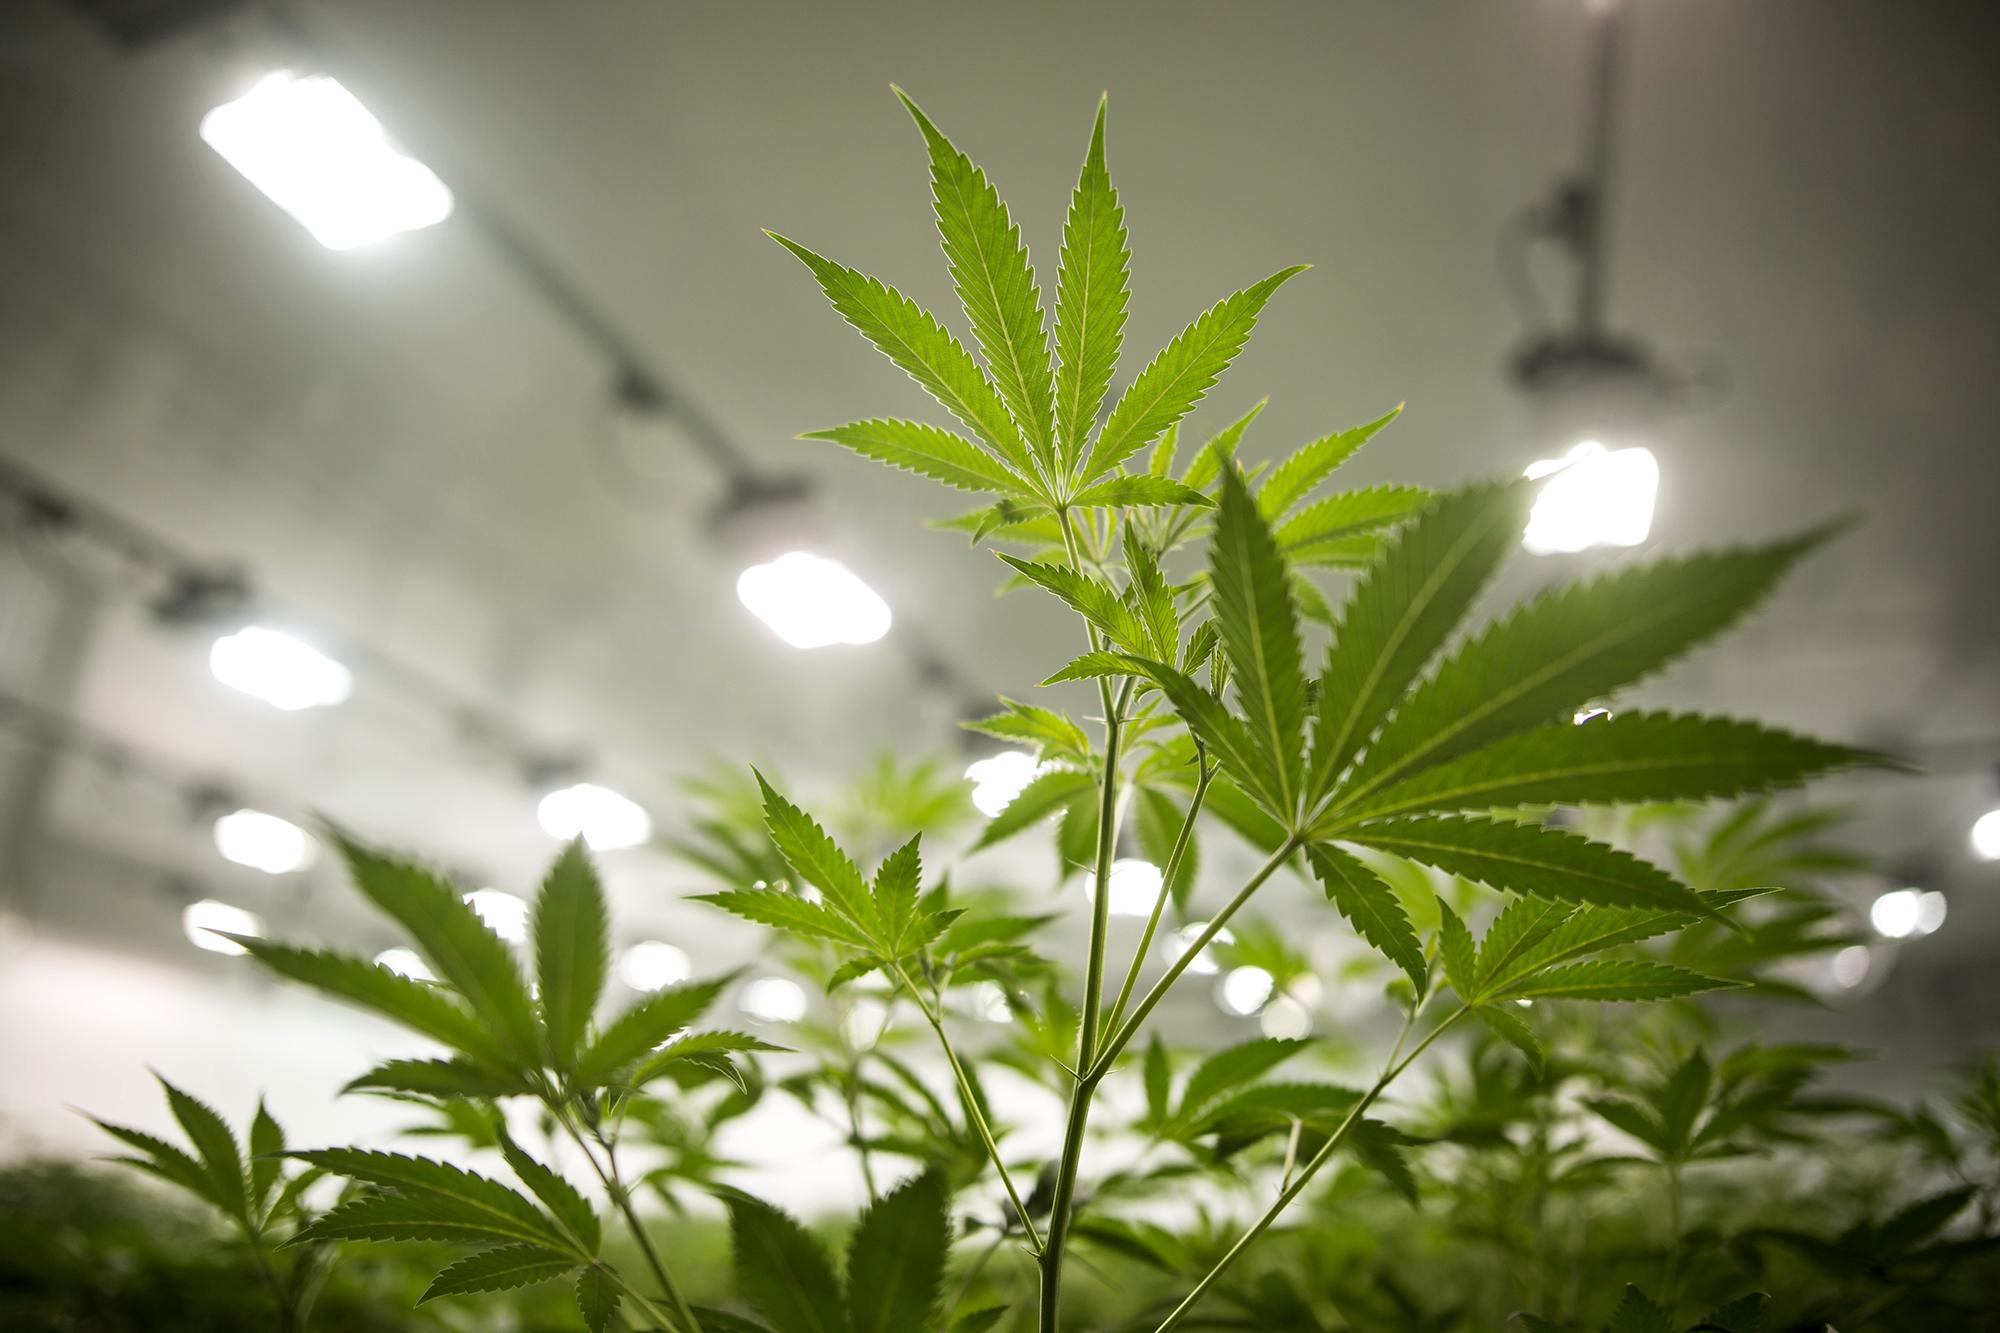 It's 4/20. Cannabis stocks are smoking hot